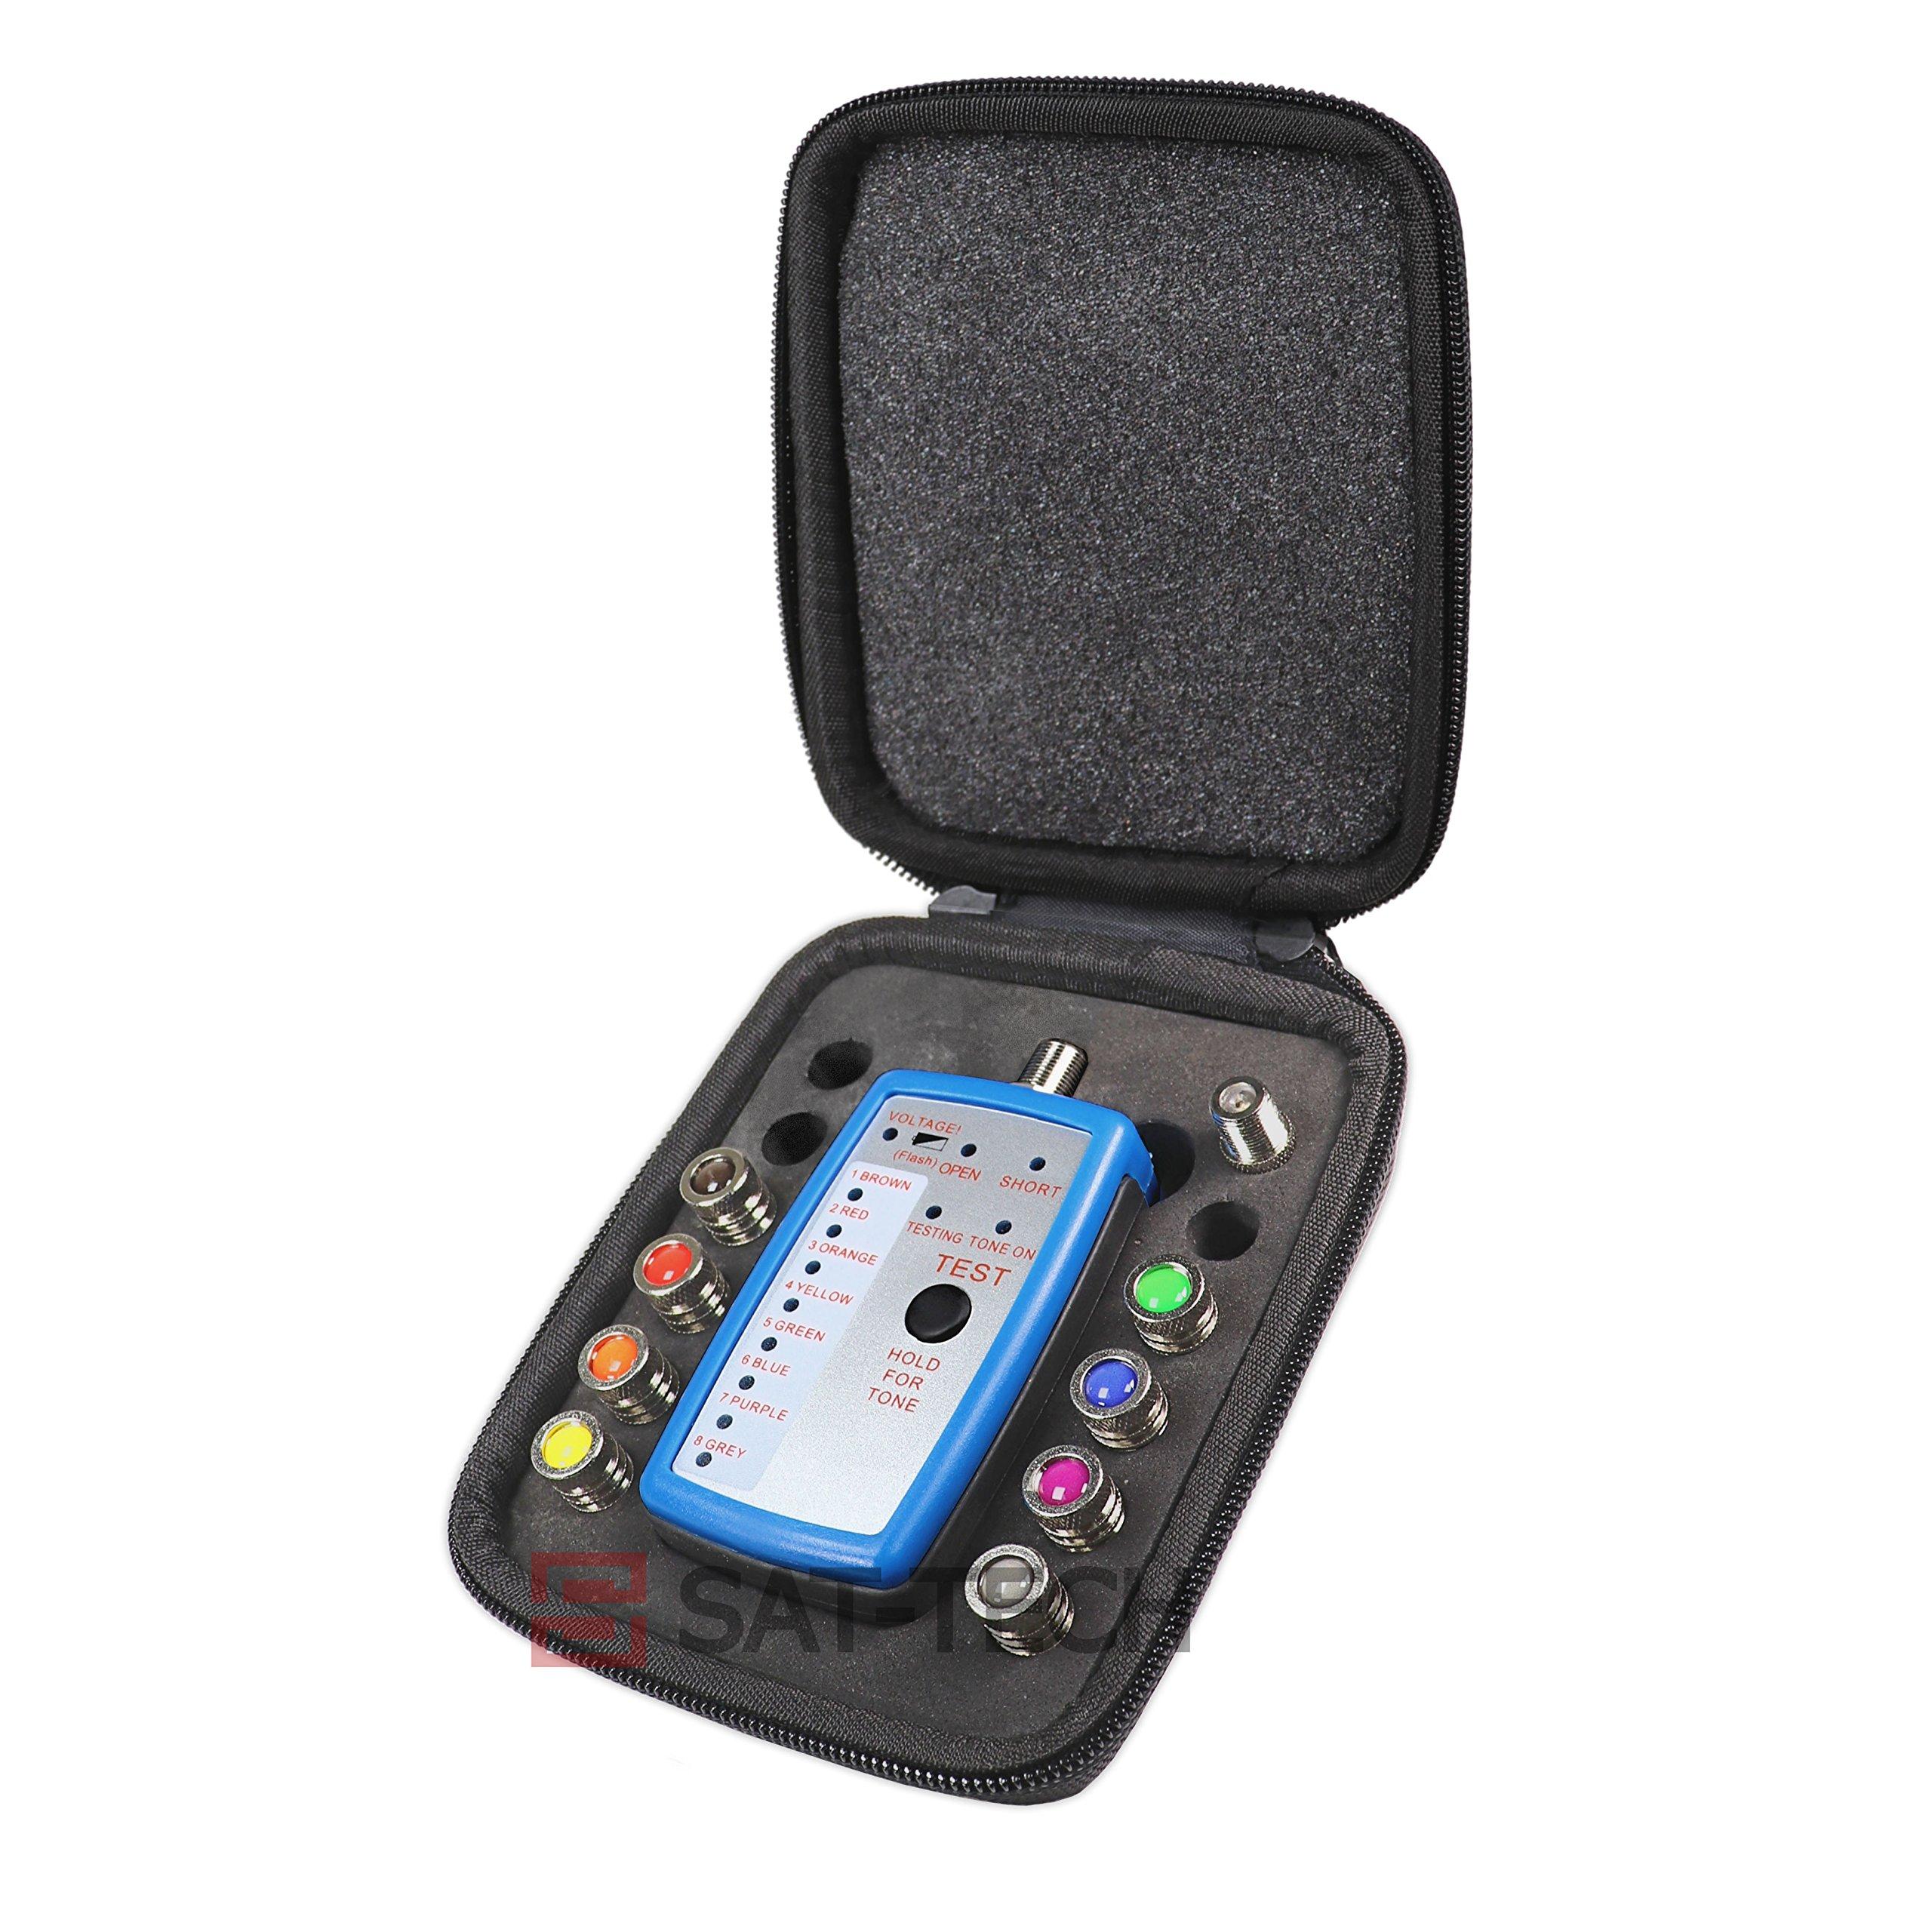 Advantage 8 Way Coax Cable Mapper Toner Tracker by Advantage